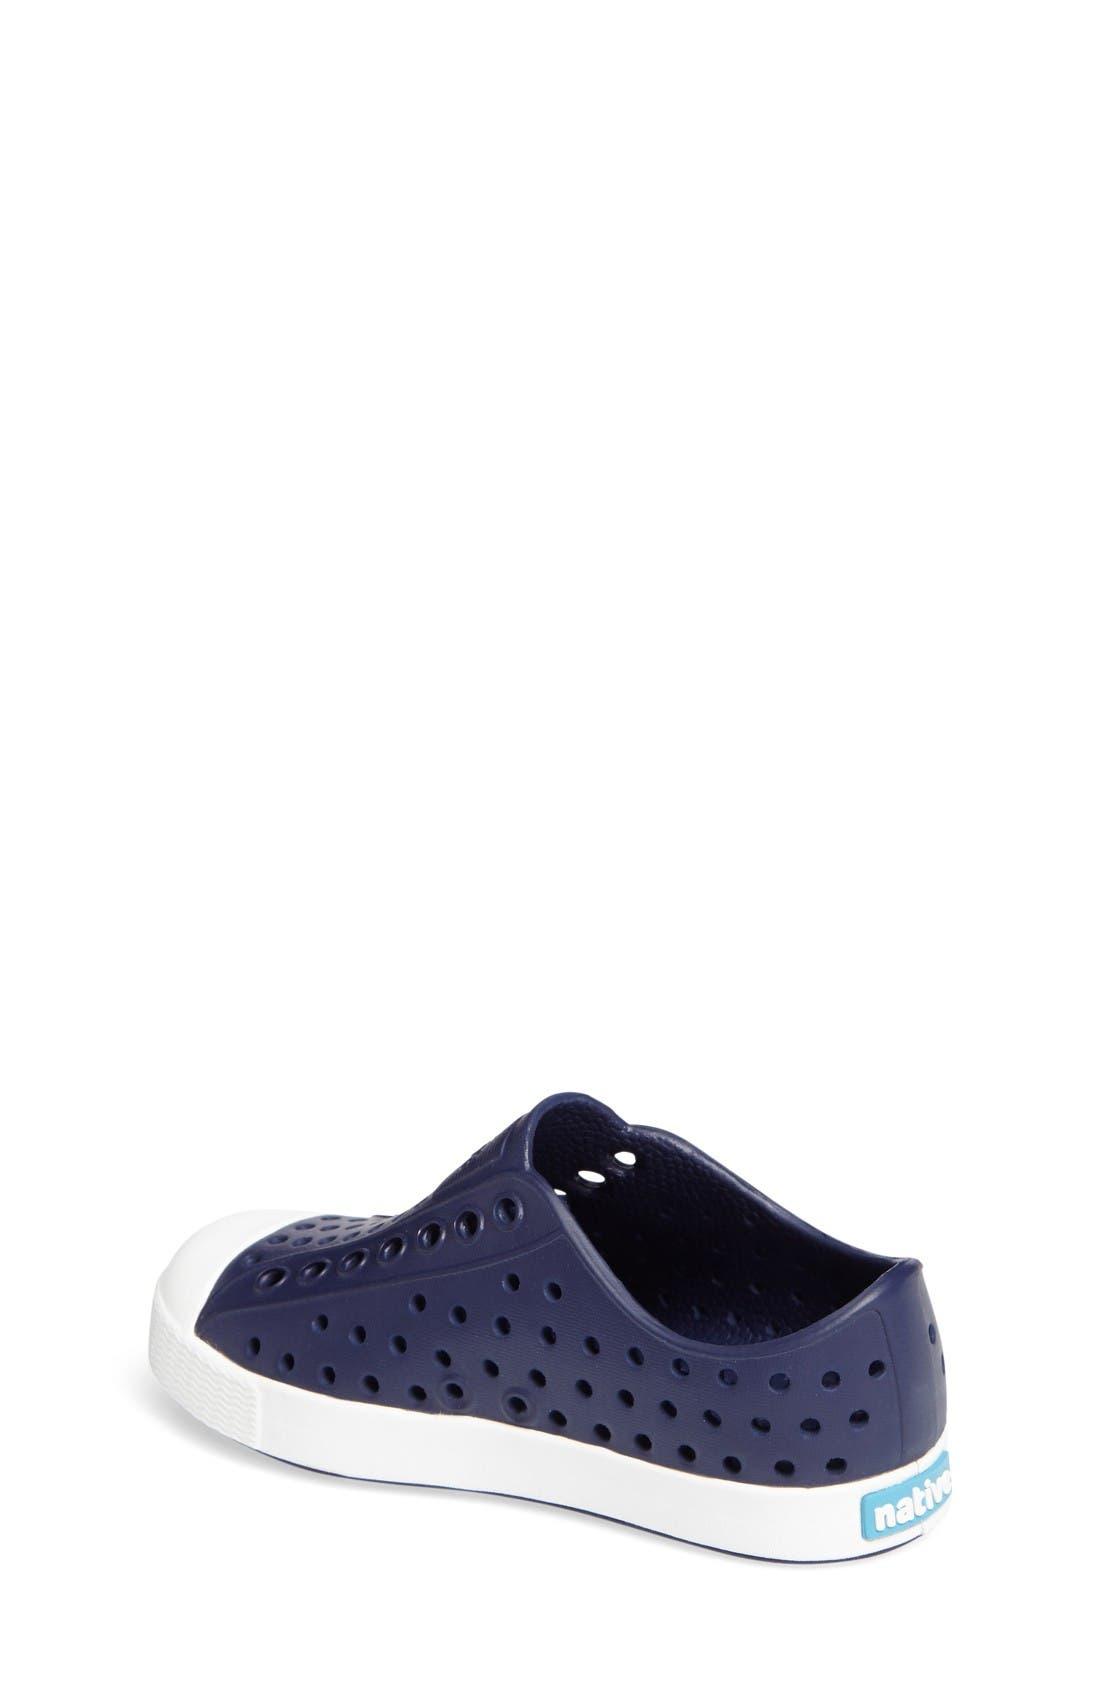 'Jefferson' Water Friendly Slip-On Sneaker,                             Alternate thumbnail 2, color,                             Regatta Blue/ Shell White